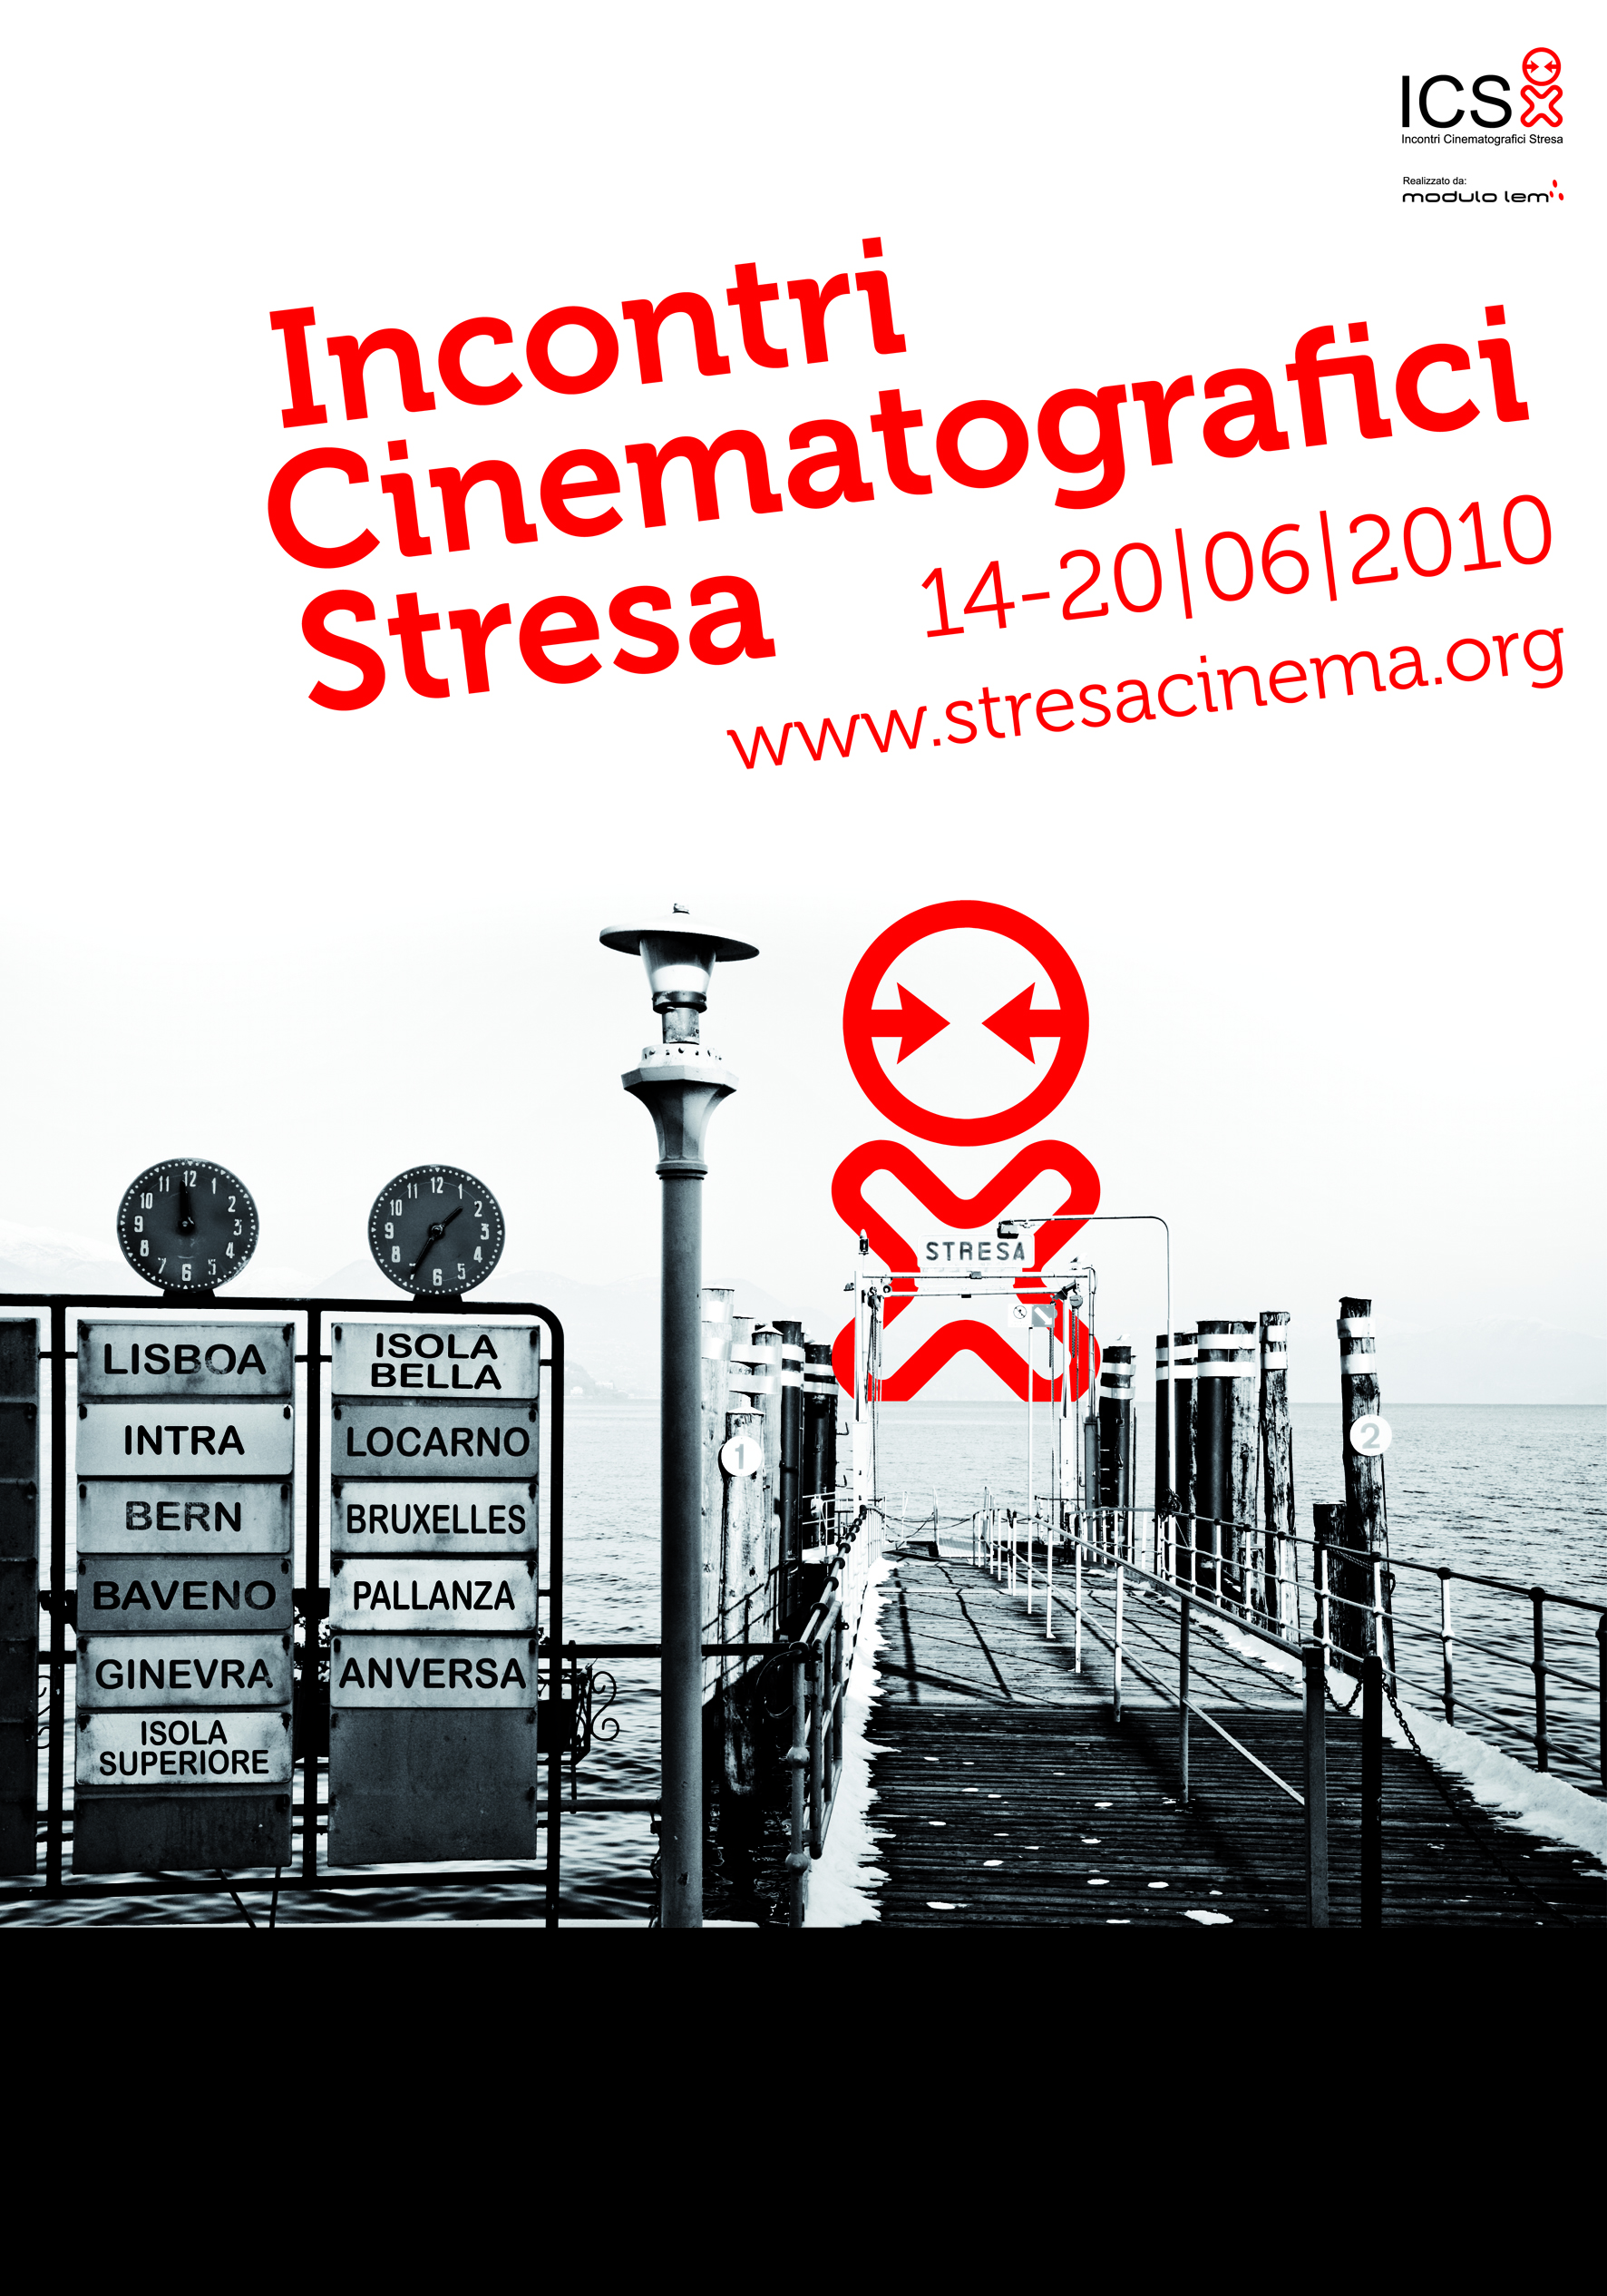 incontri cinematografici stresa